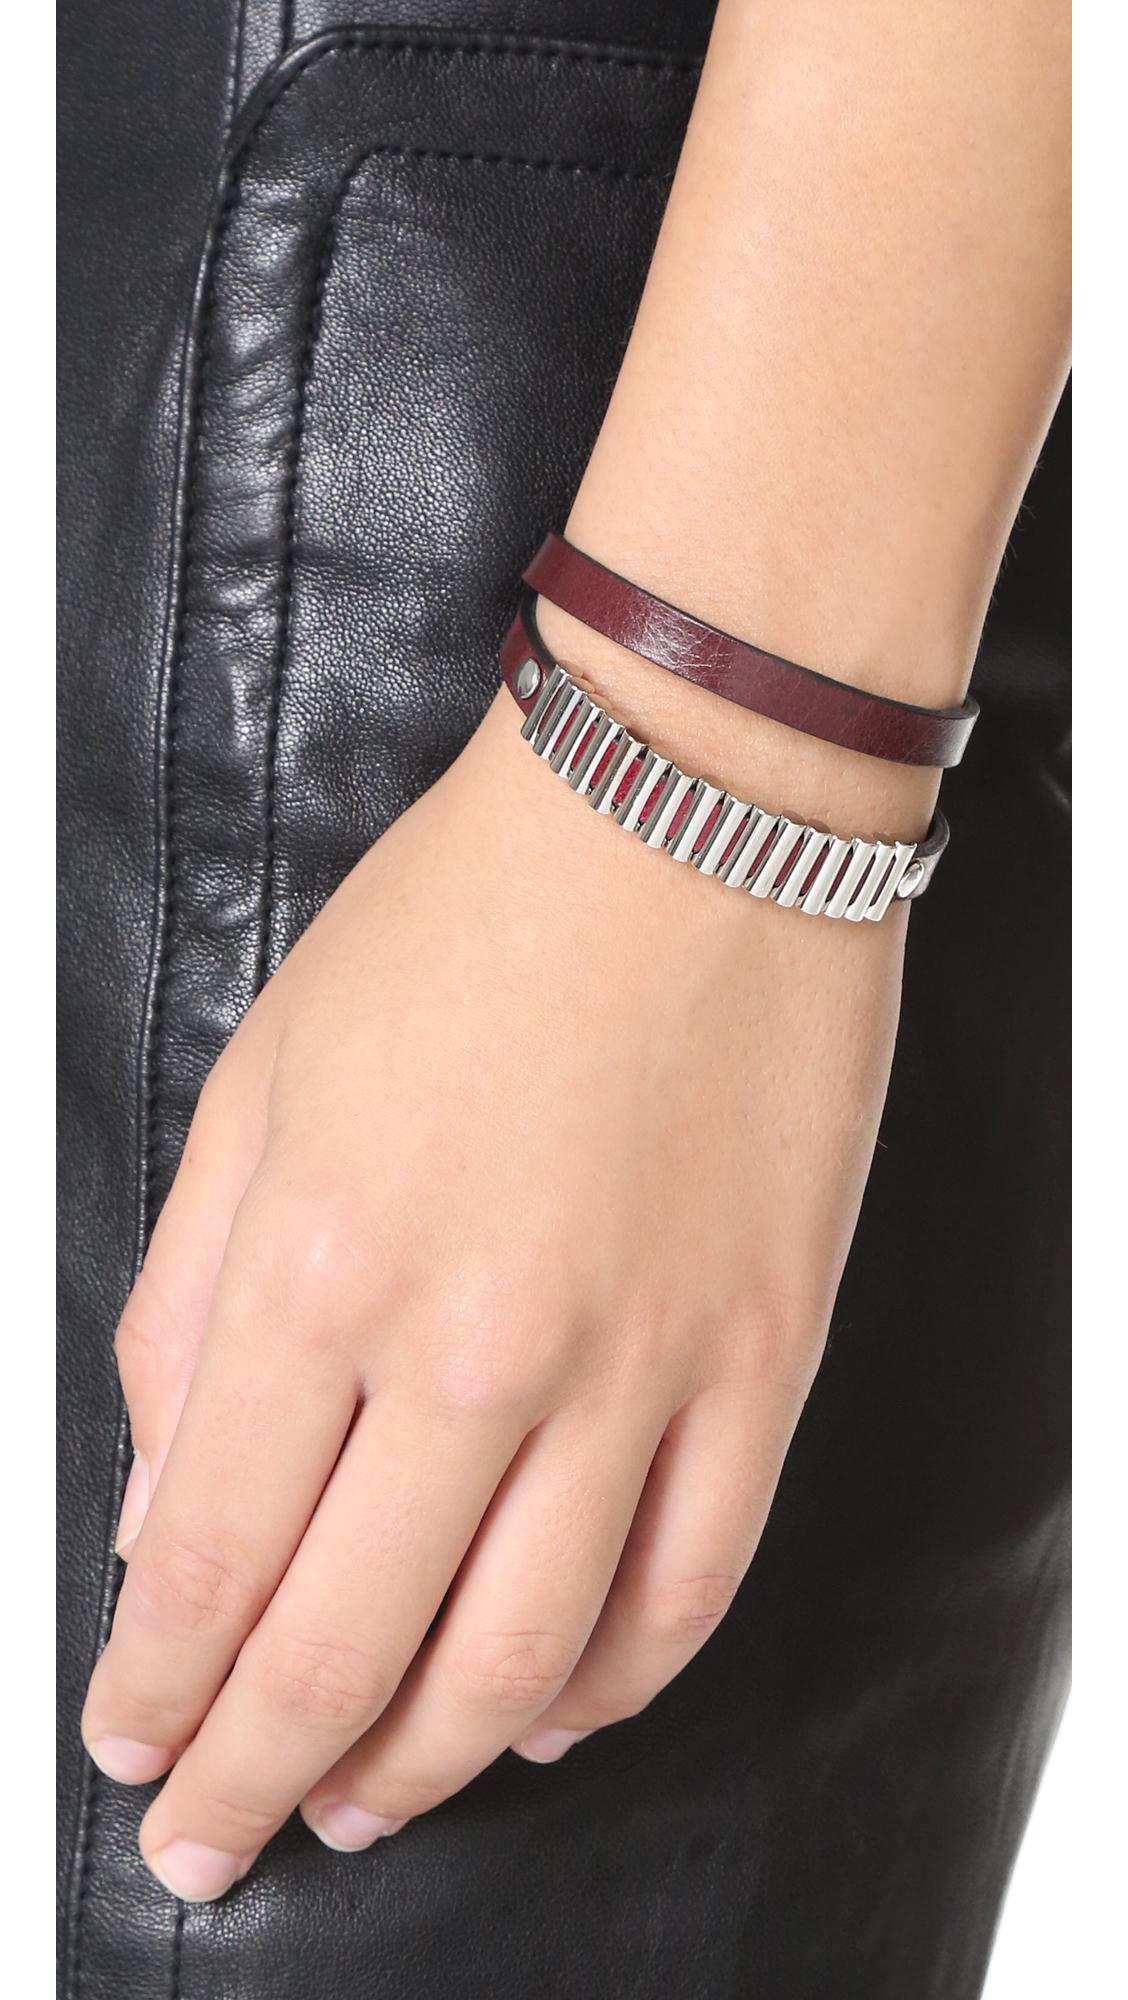 Alexander McQueen Mini Bullets Wrap Bracelet in Burgundy hgFI46